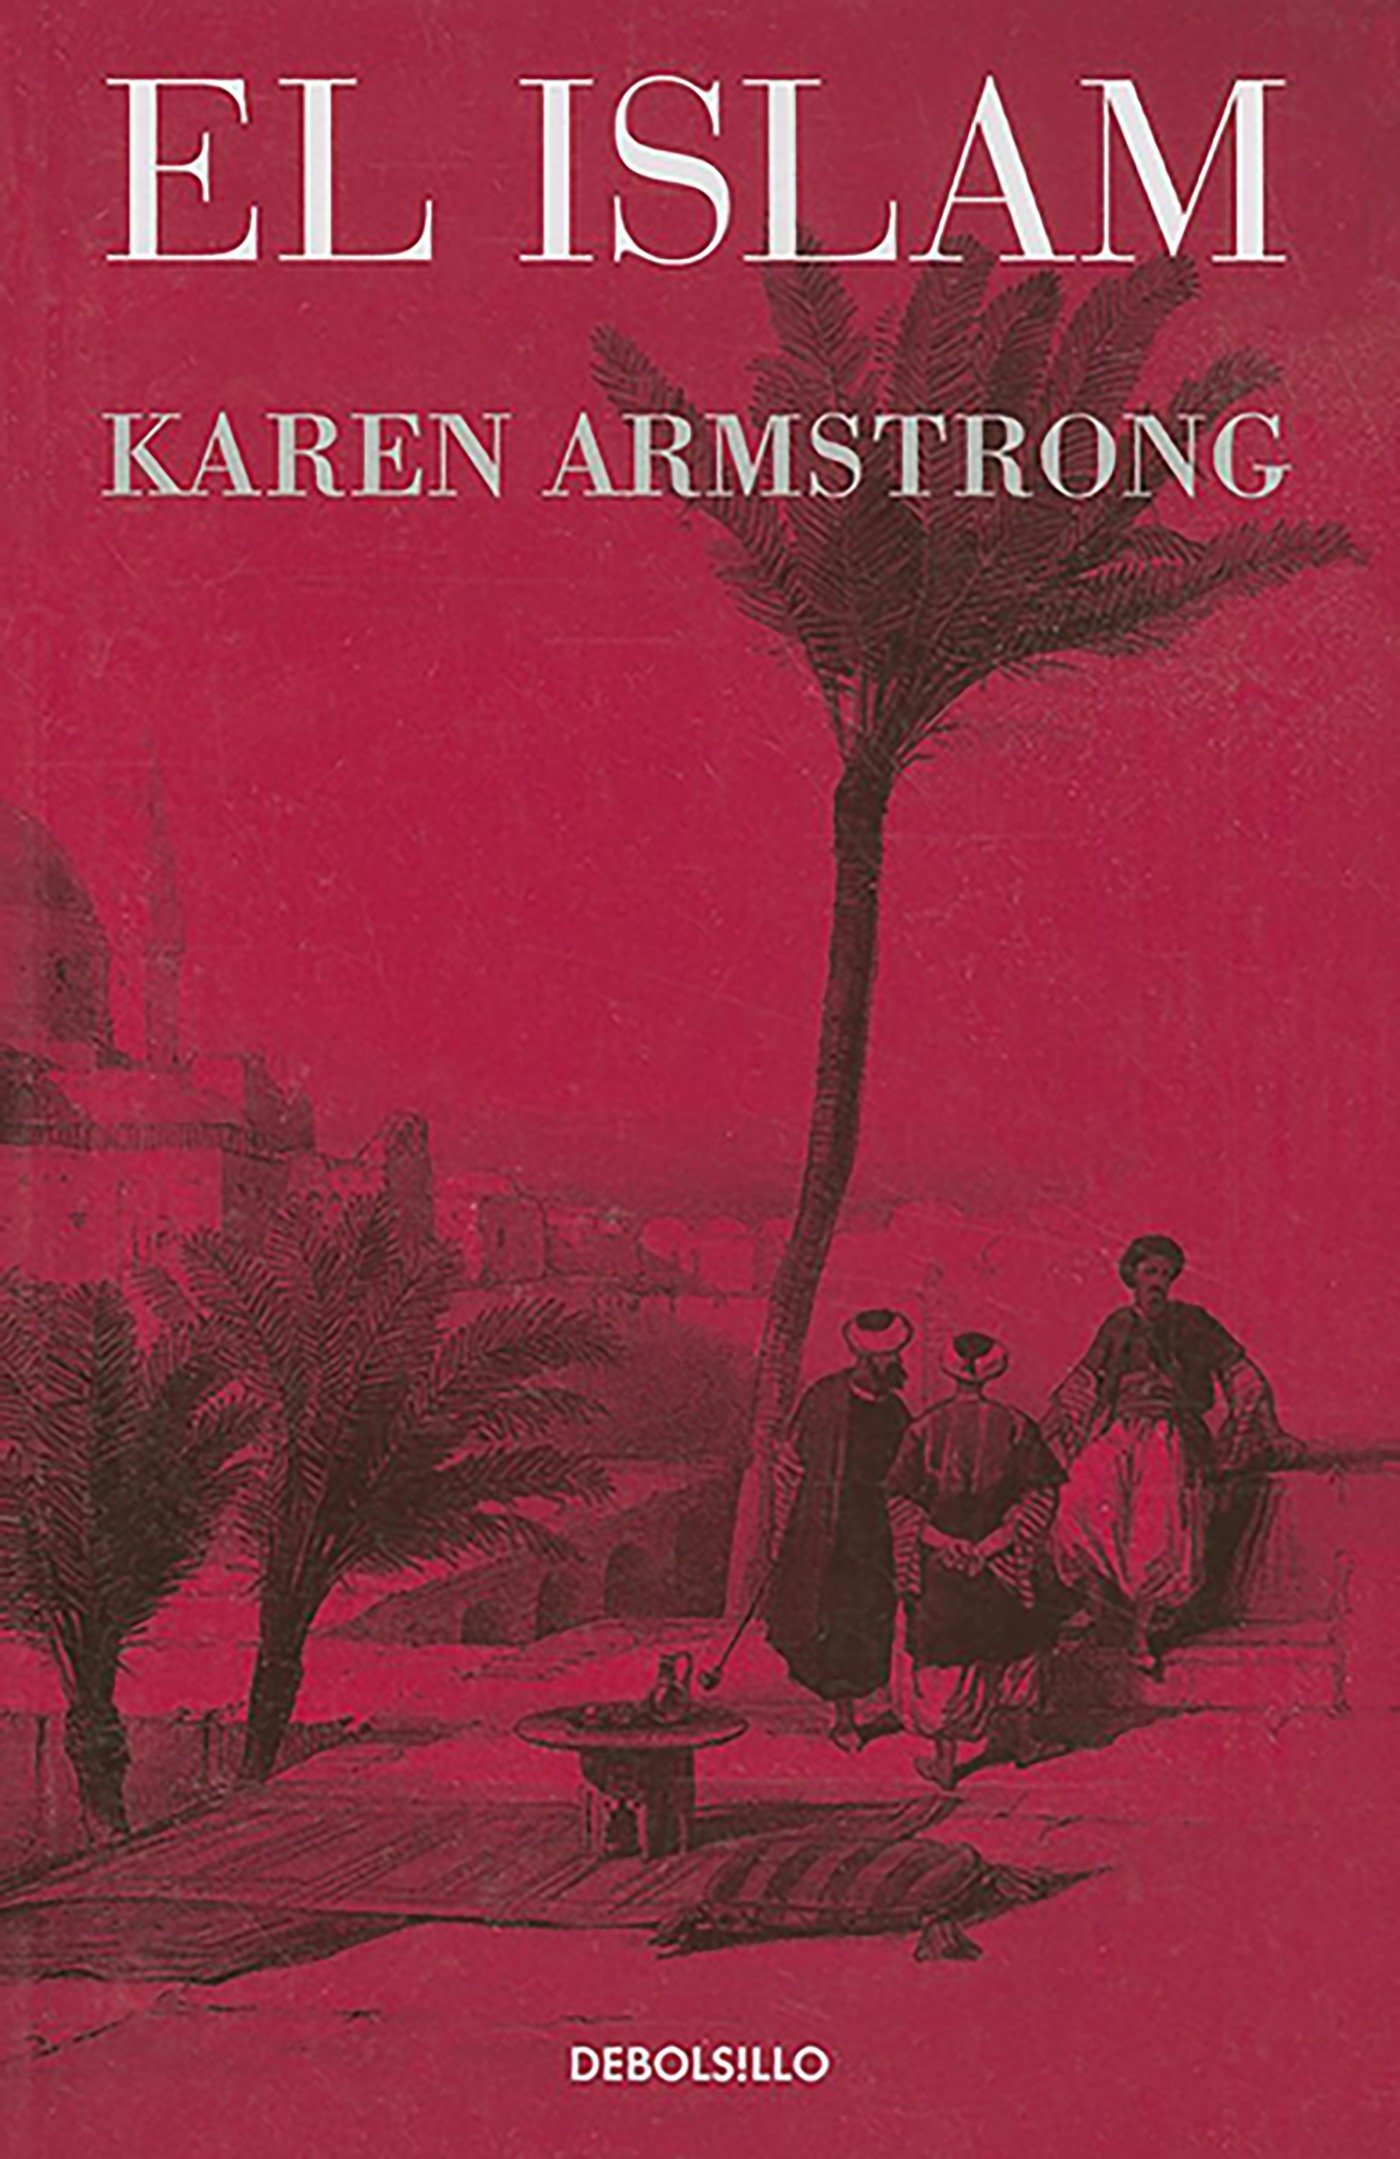 El Islam / Islam (Ensayo): Amazon.es: Armstrong, Karen: Libros